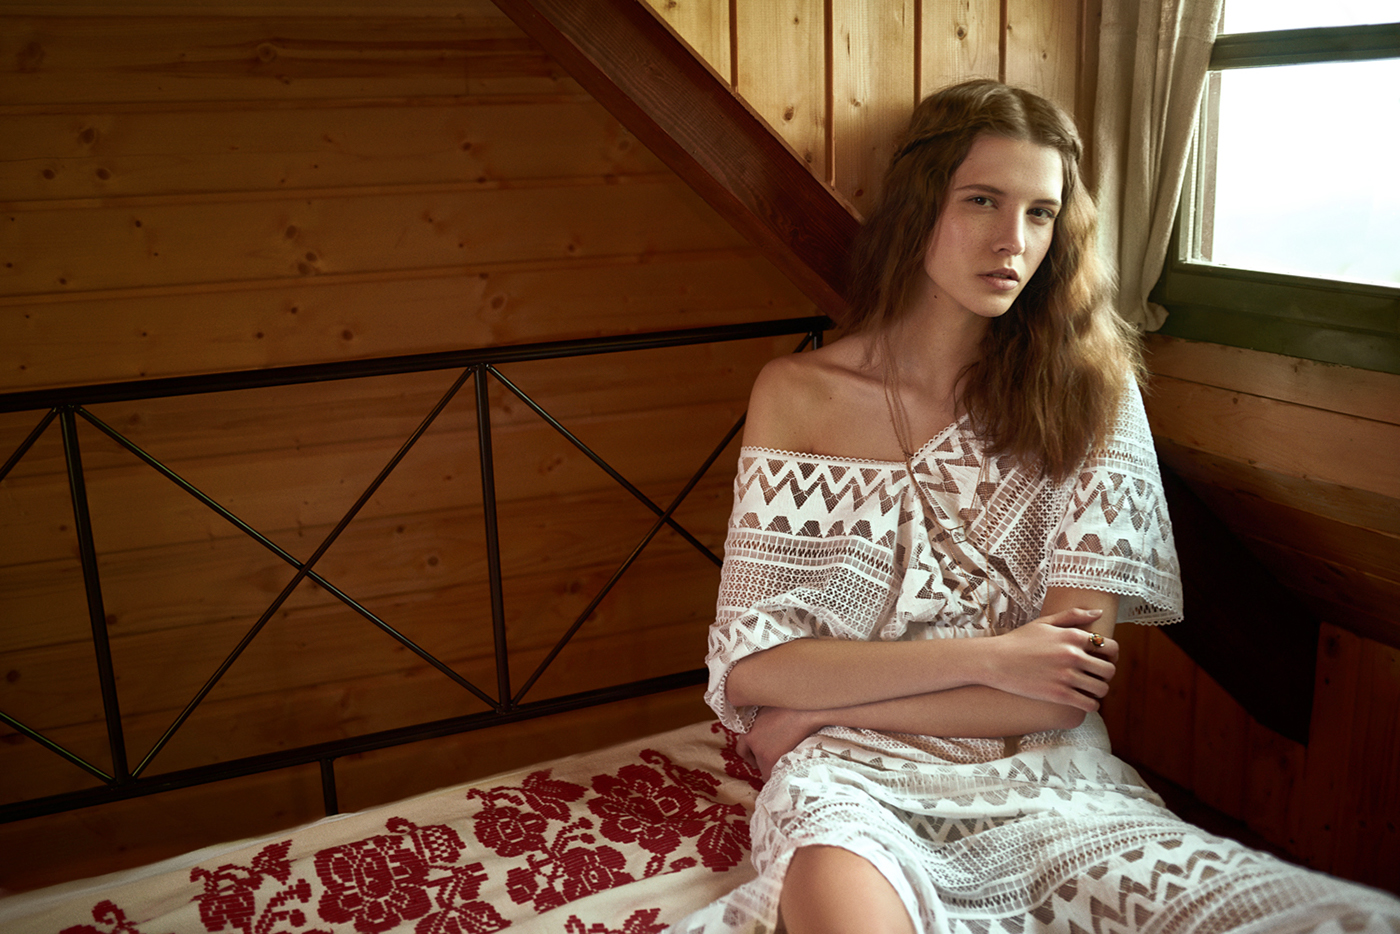 фотосессия для Budi.IN CHIC magazine / модель Sara Sorić - фотограф Franjo Matković